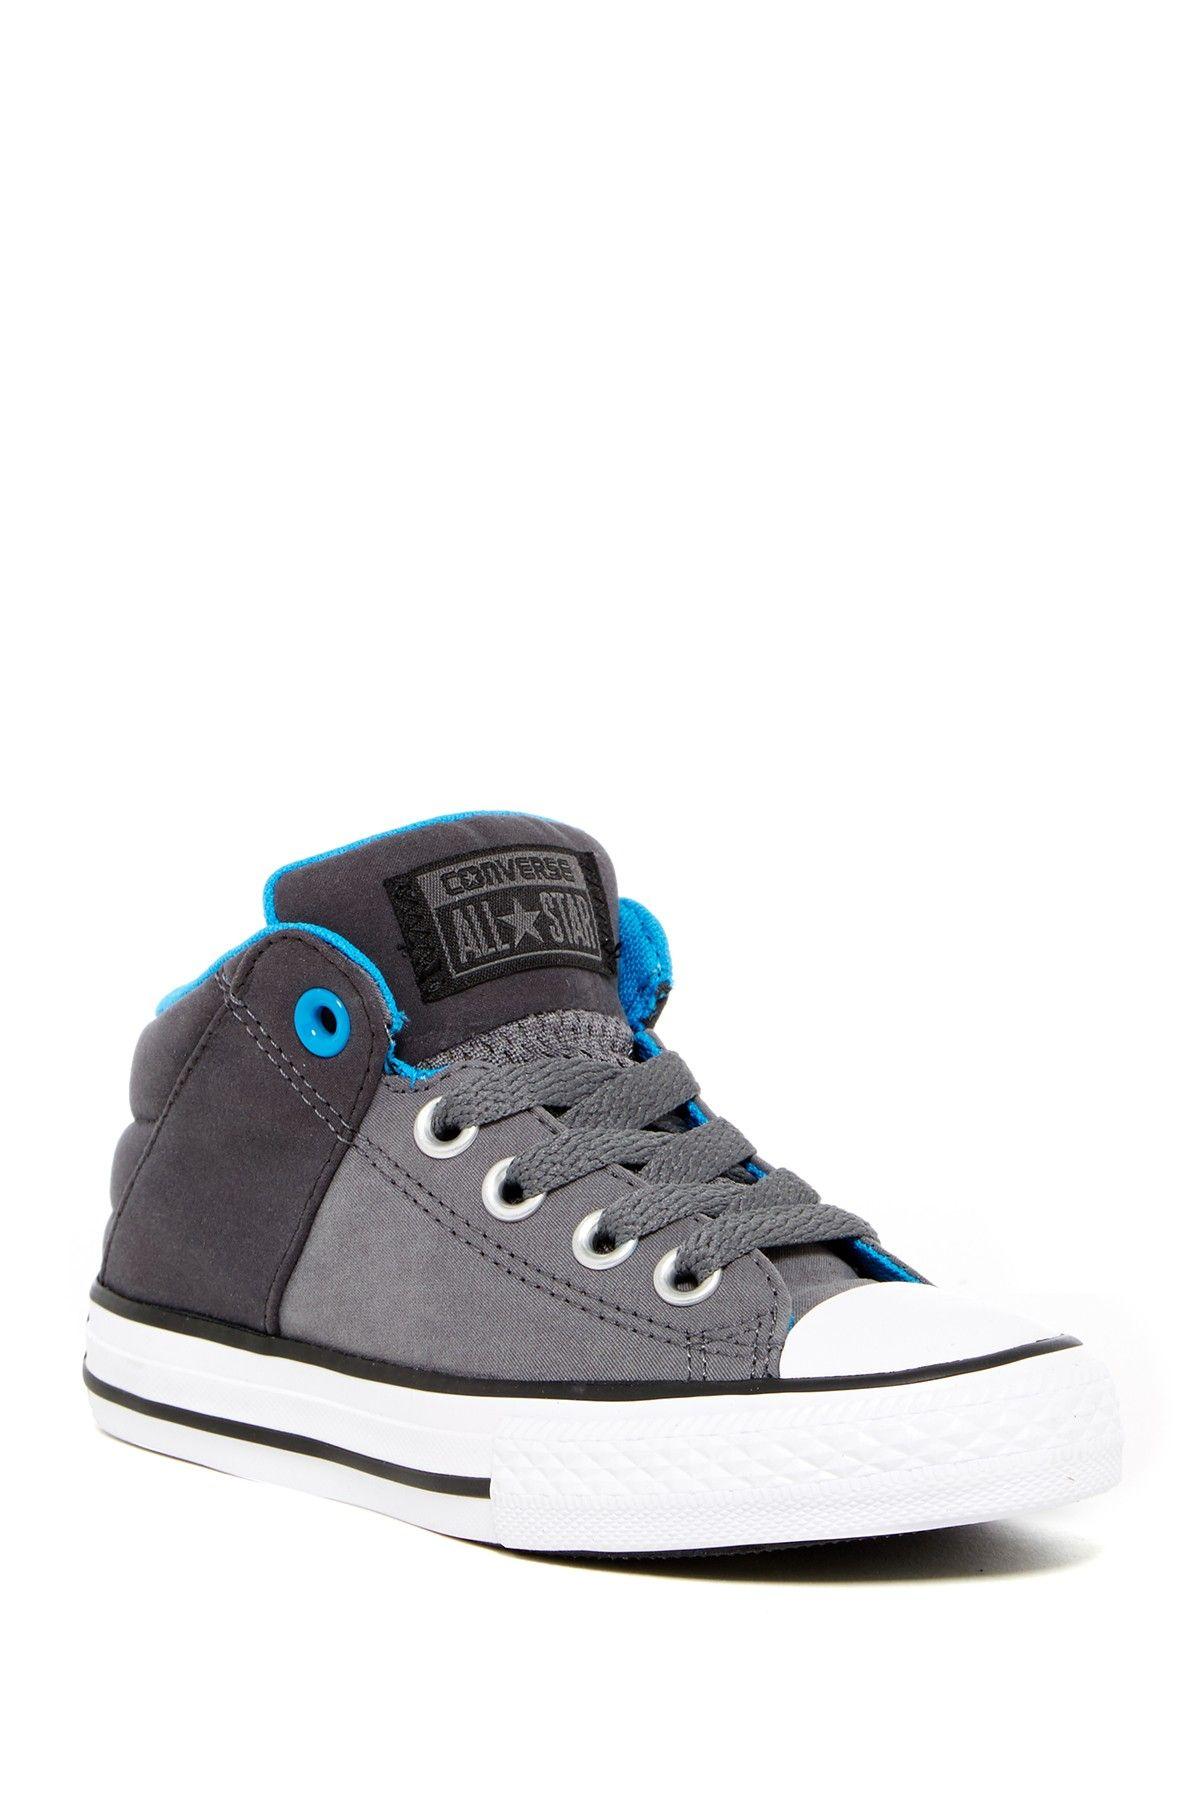 Chuck Taylor All Star Axel Mid Slip On Sneaker (Little Kid